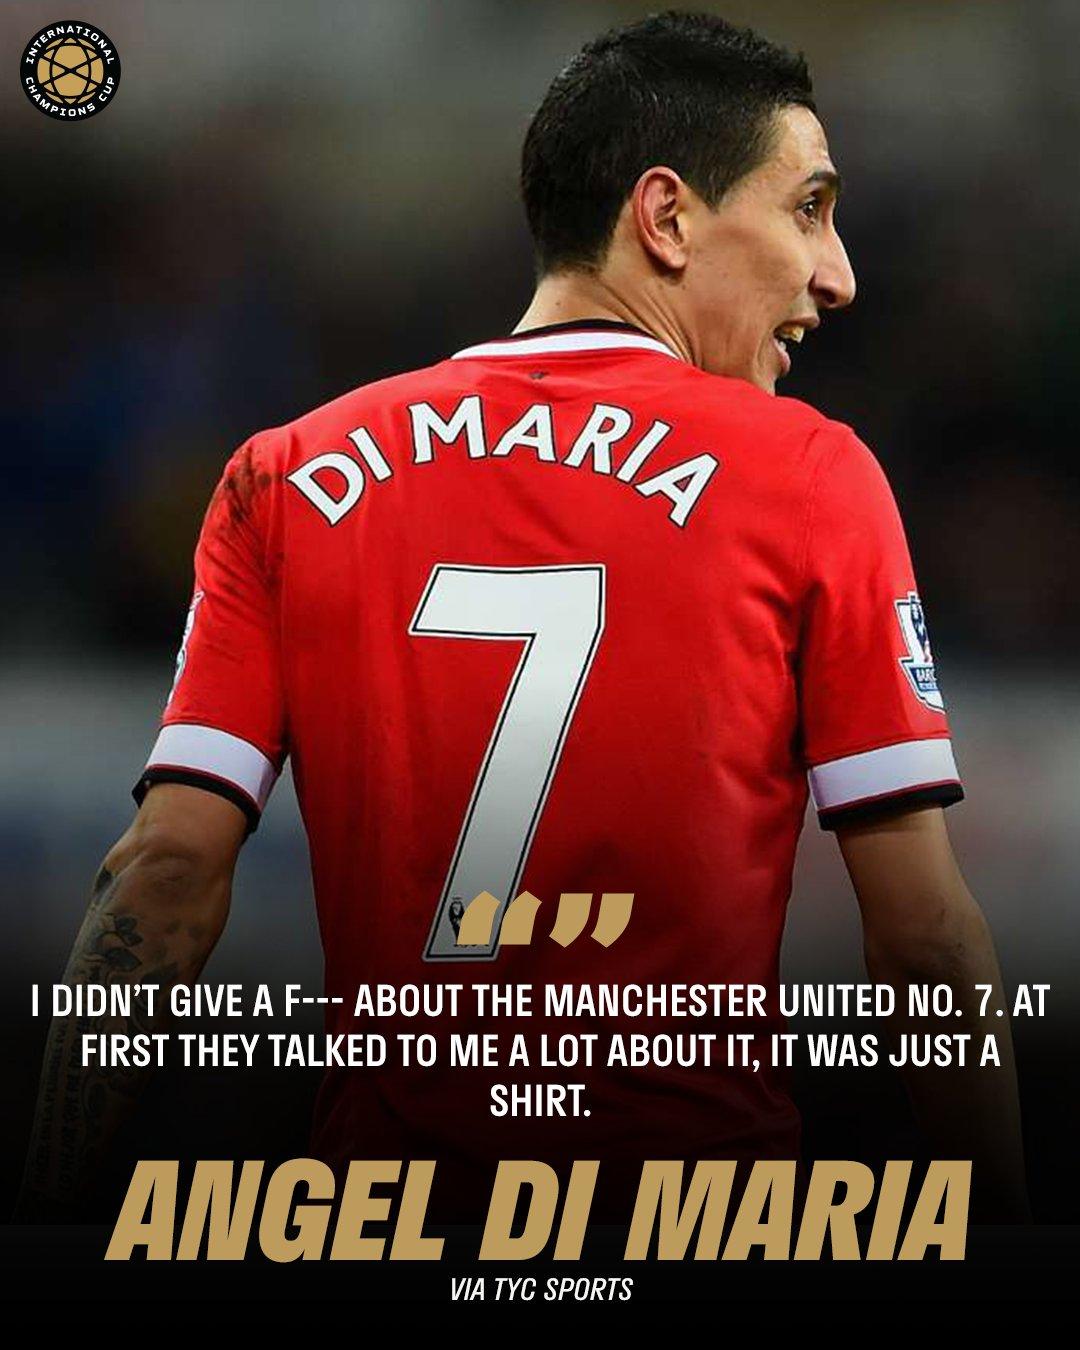 O Ντι Μαρία μάλλον δεν ξέρει από... ιστορία!